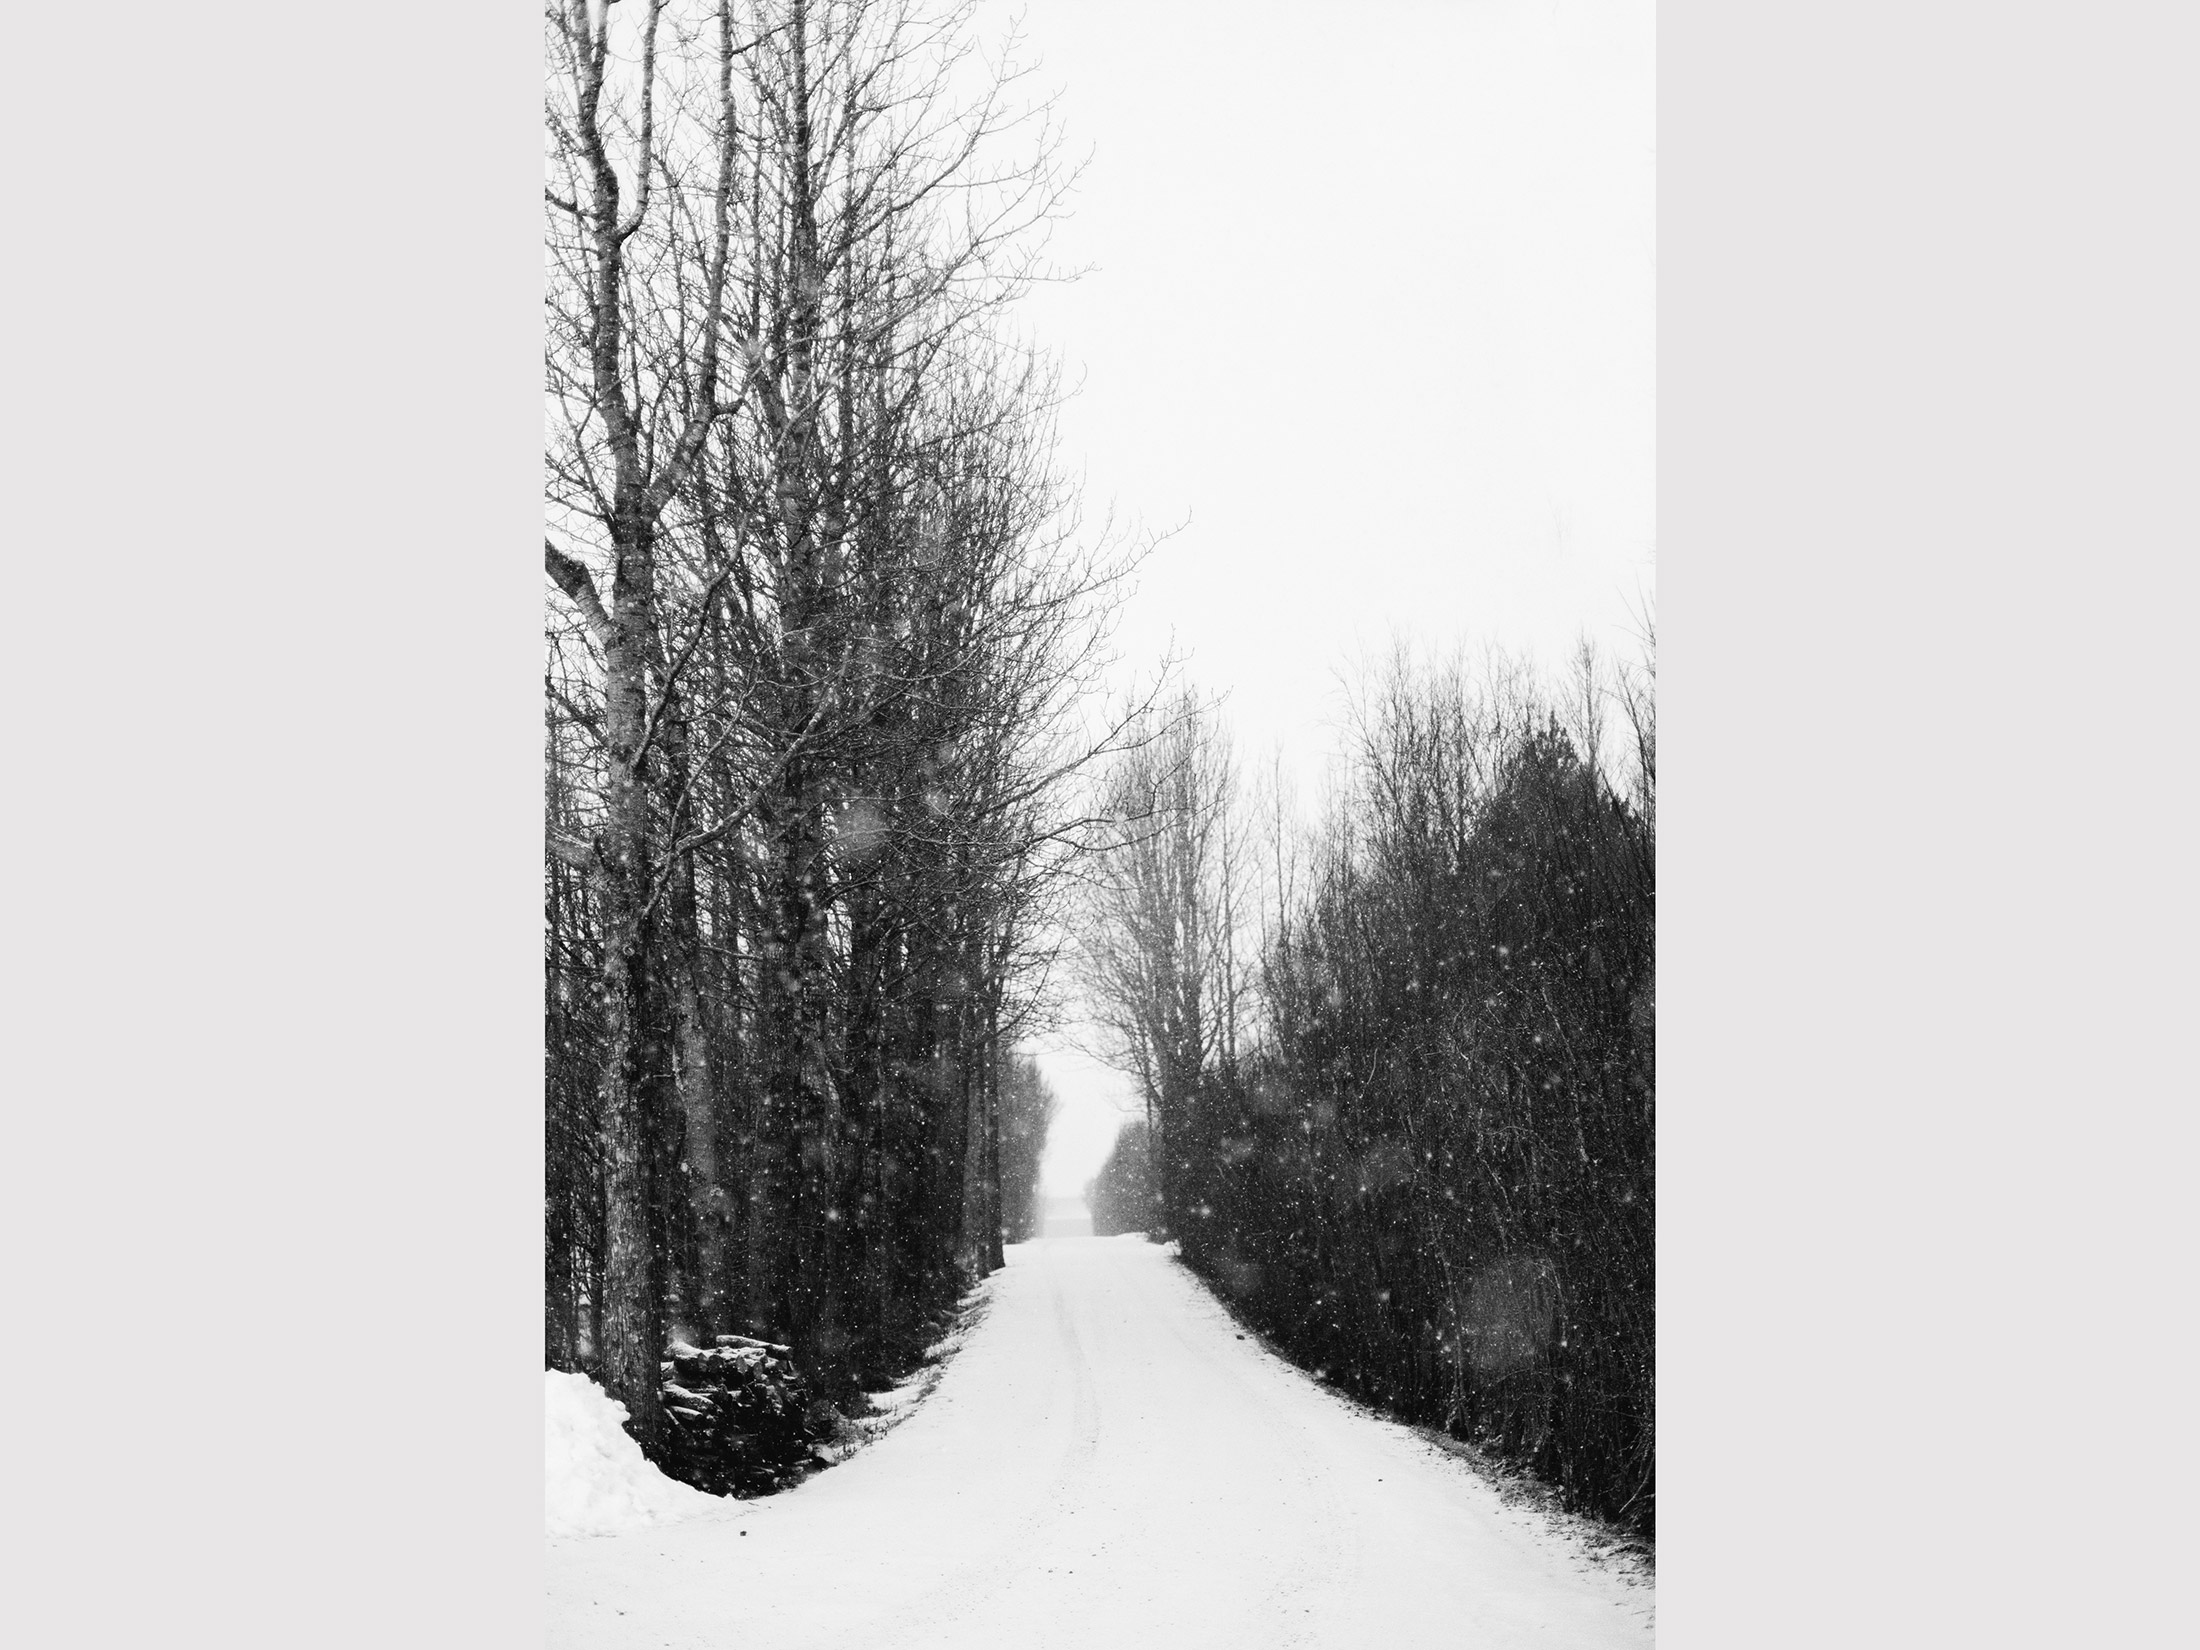 iceland_road.jpg